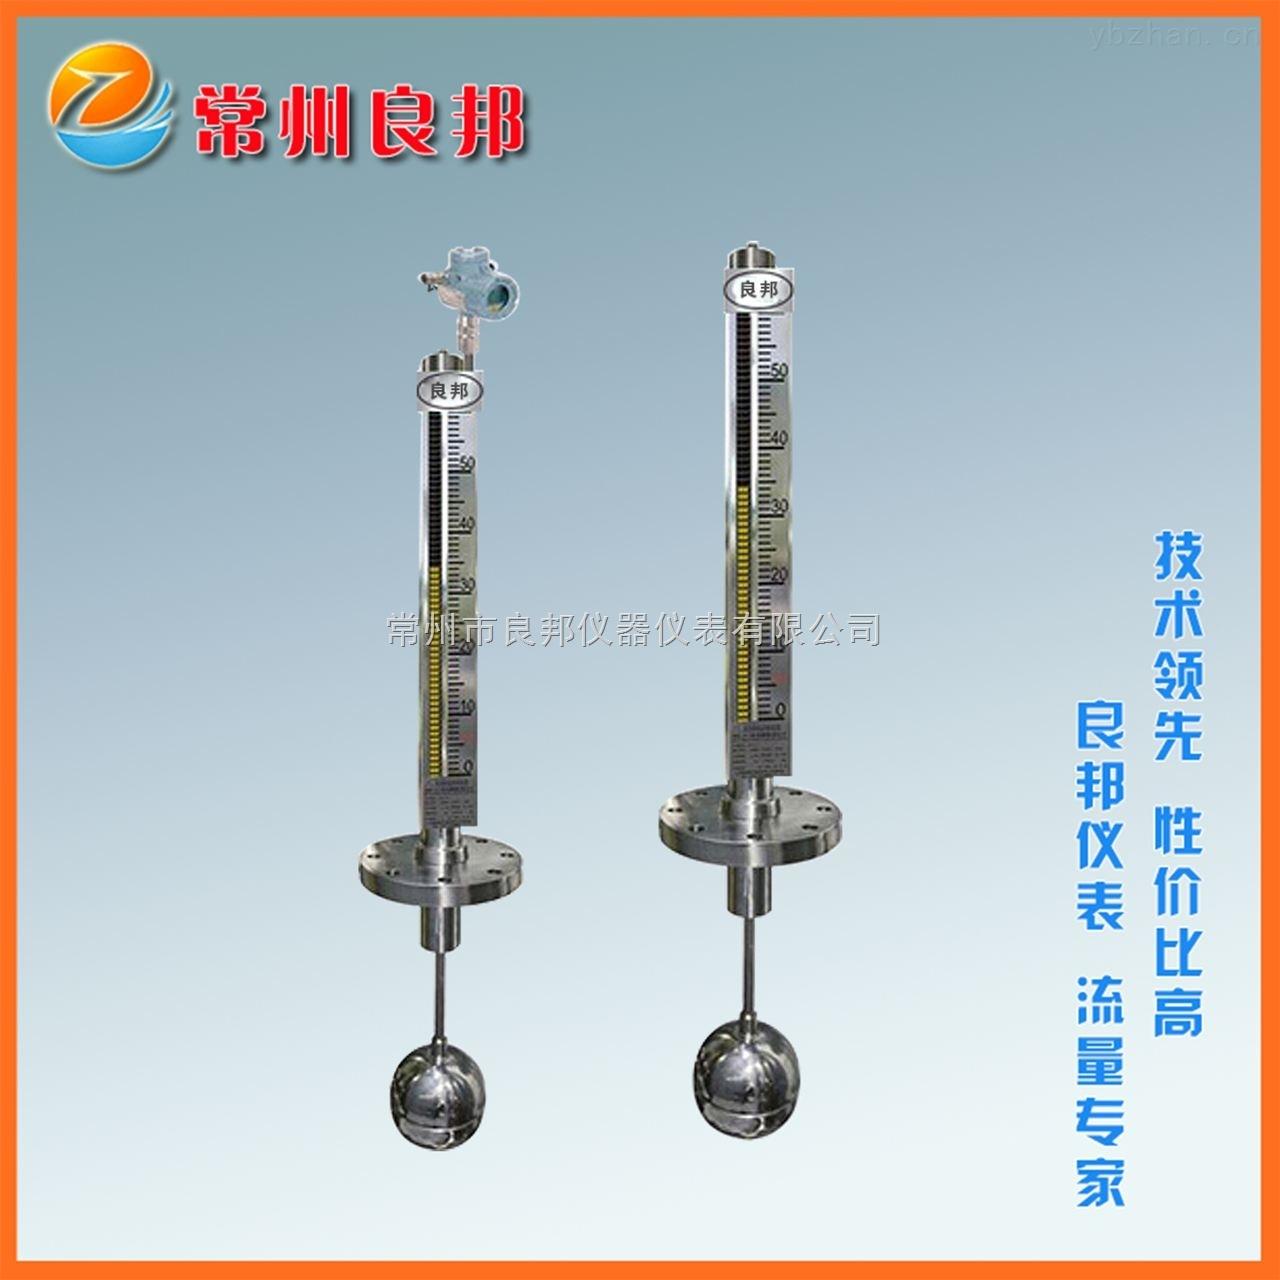 UHZ-517D-頂裝式磁翻板液位計 廠家生產價格實惠 內襯四氟耐腐蝕耐高溫